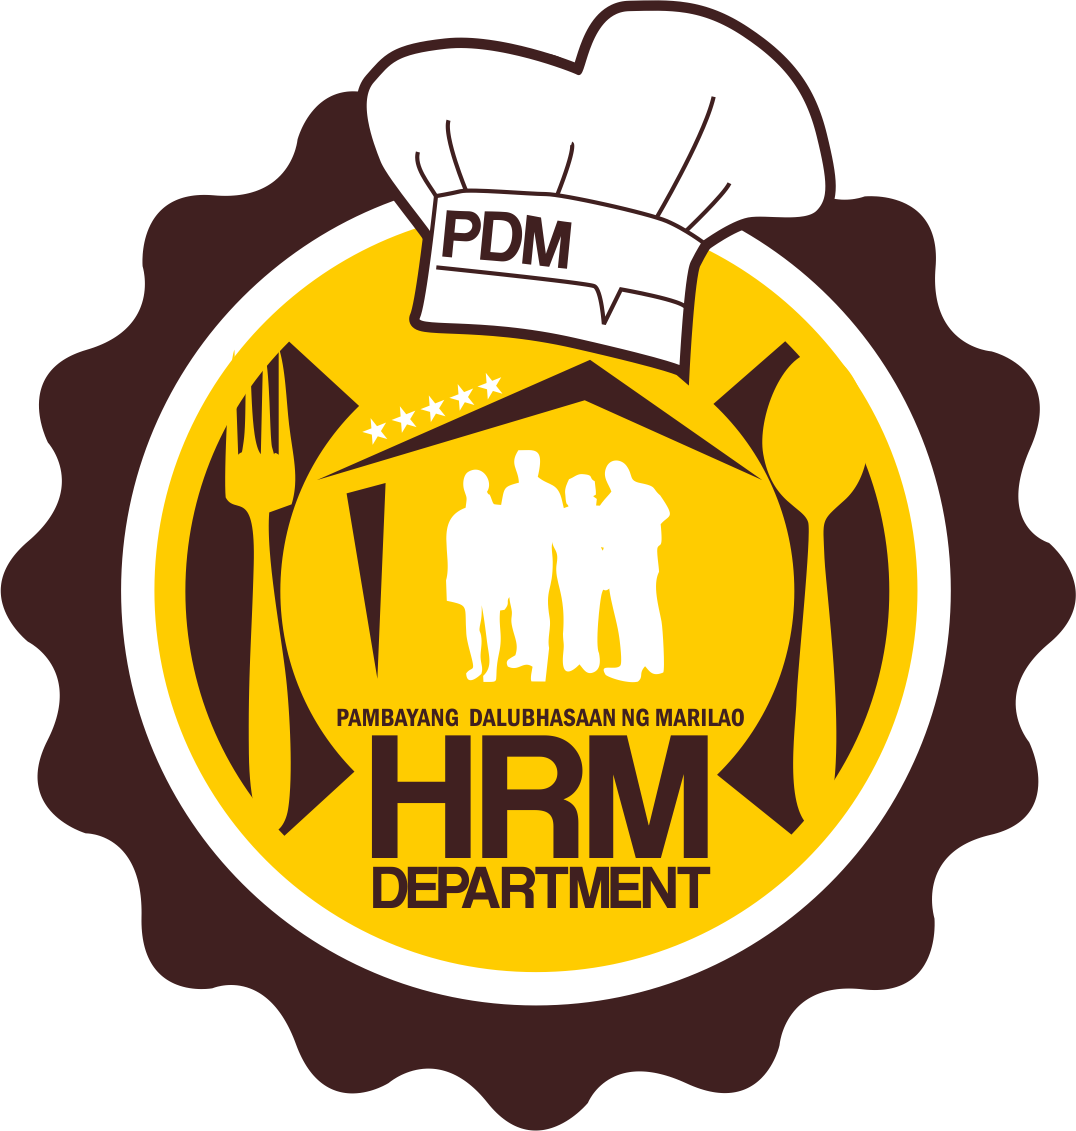 Yajooh Pdm Hrm Department Logo